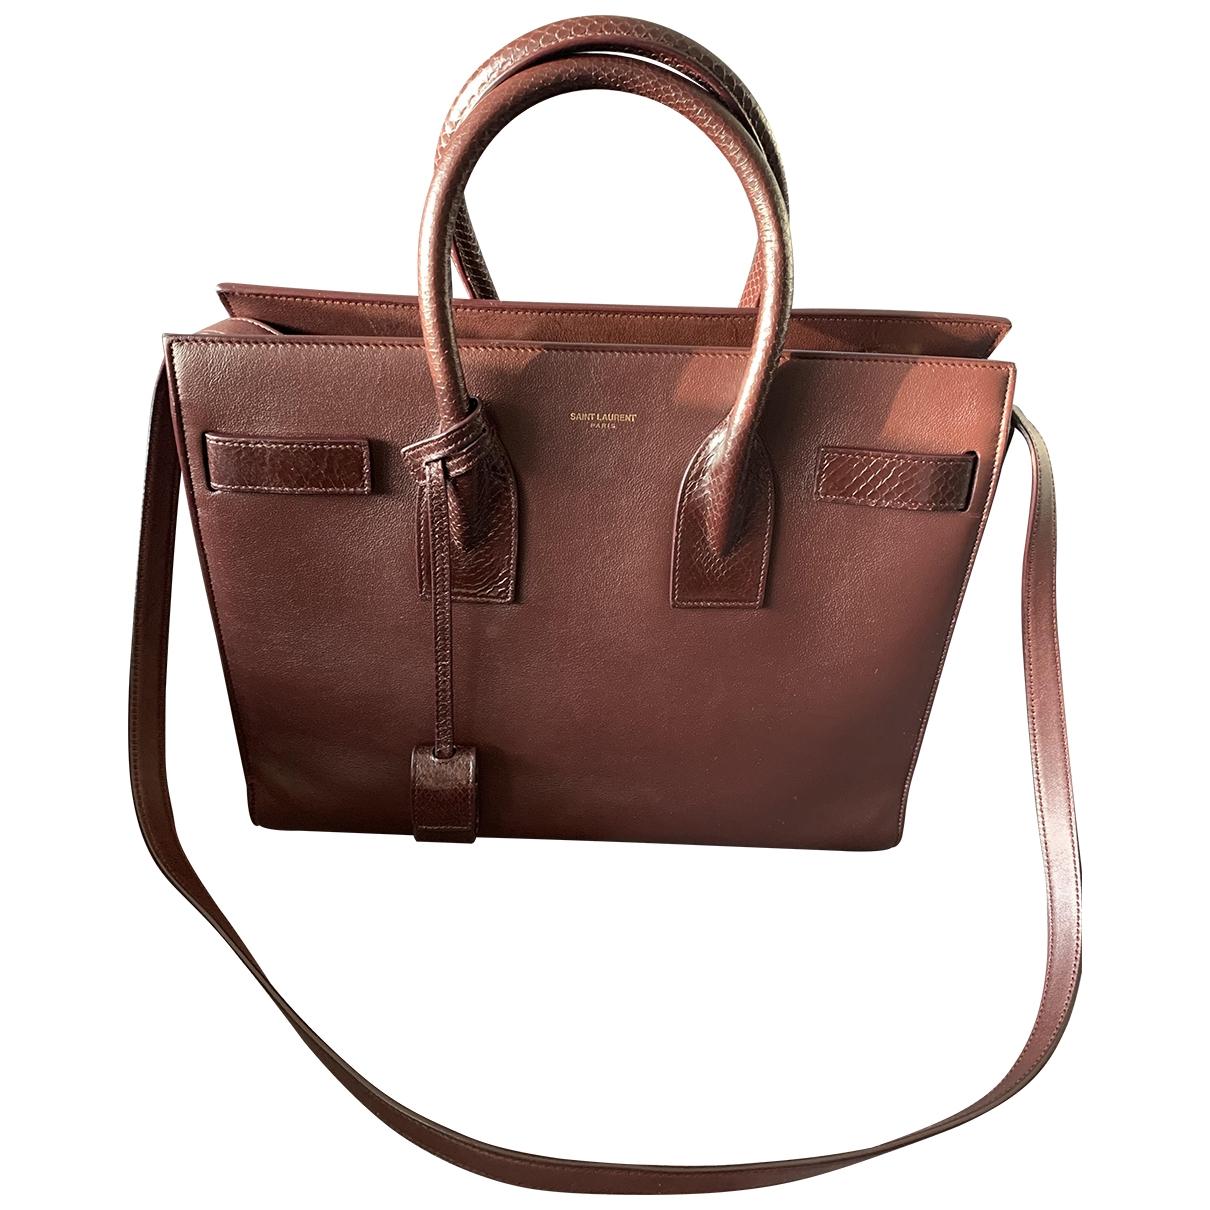 Saint Laurent Sac de Jour Burgundy Leather handbag for Women \N